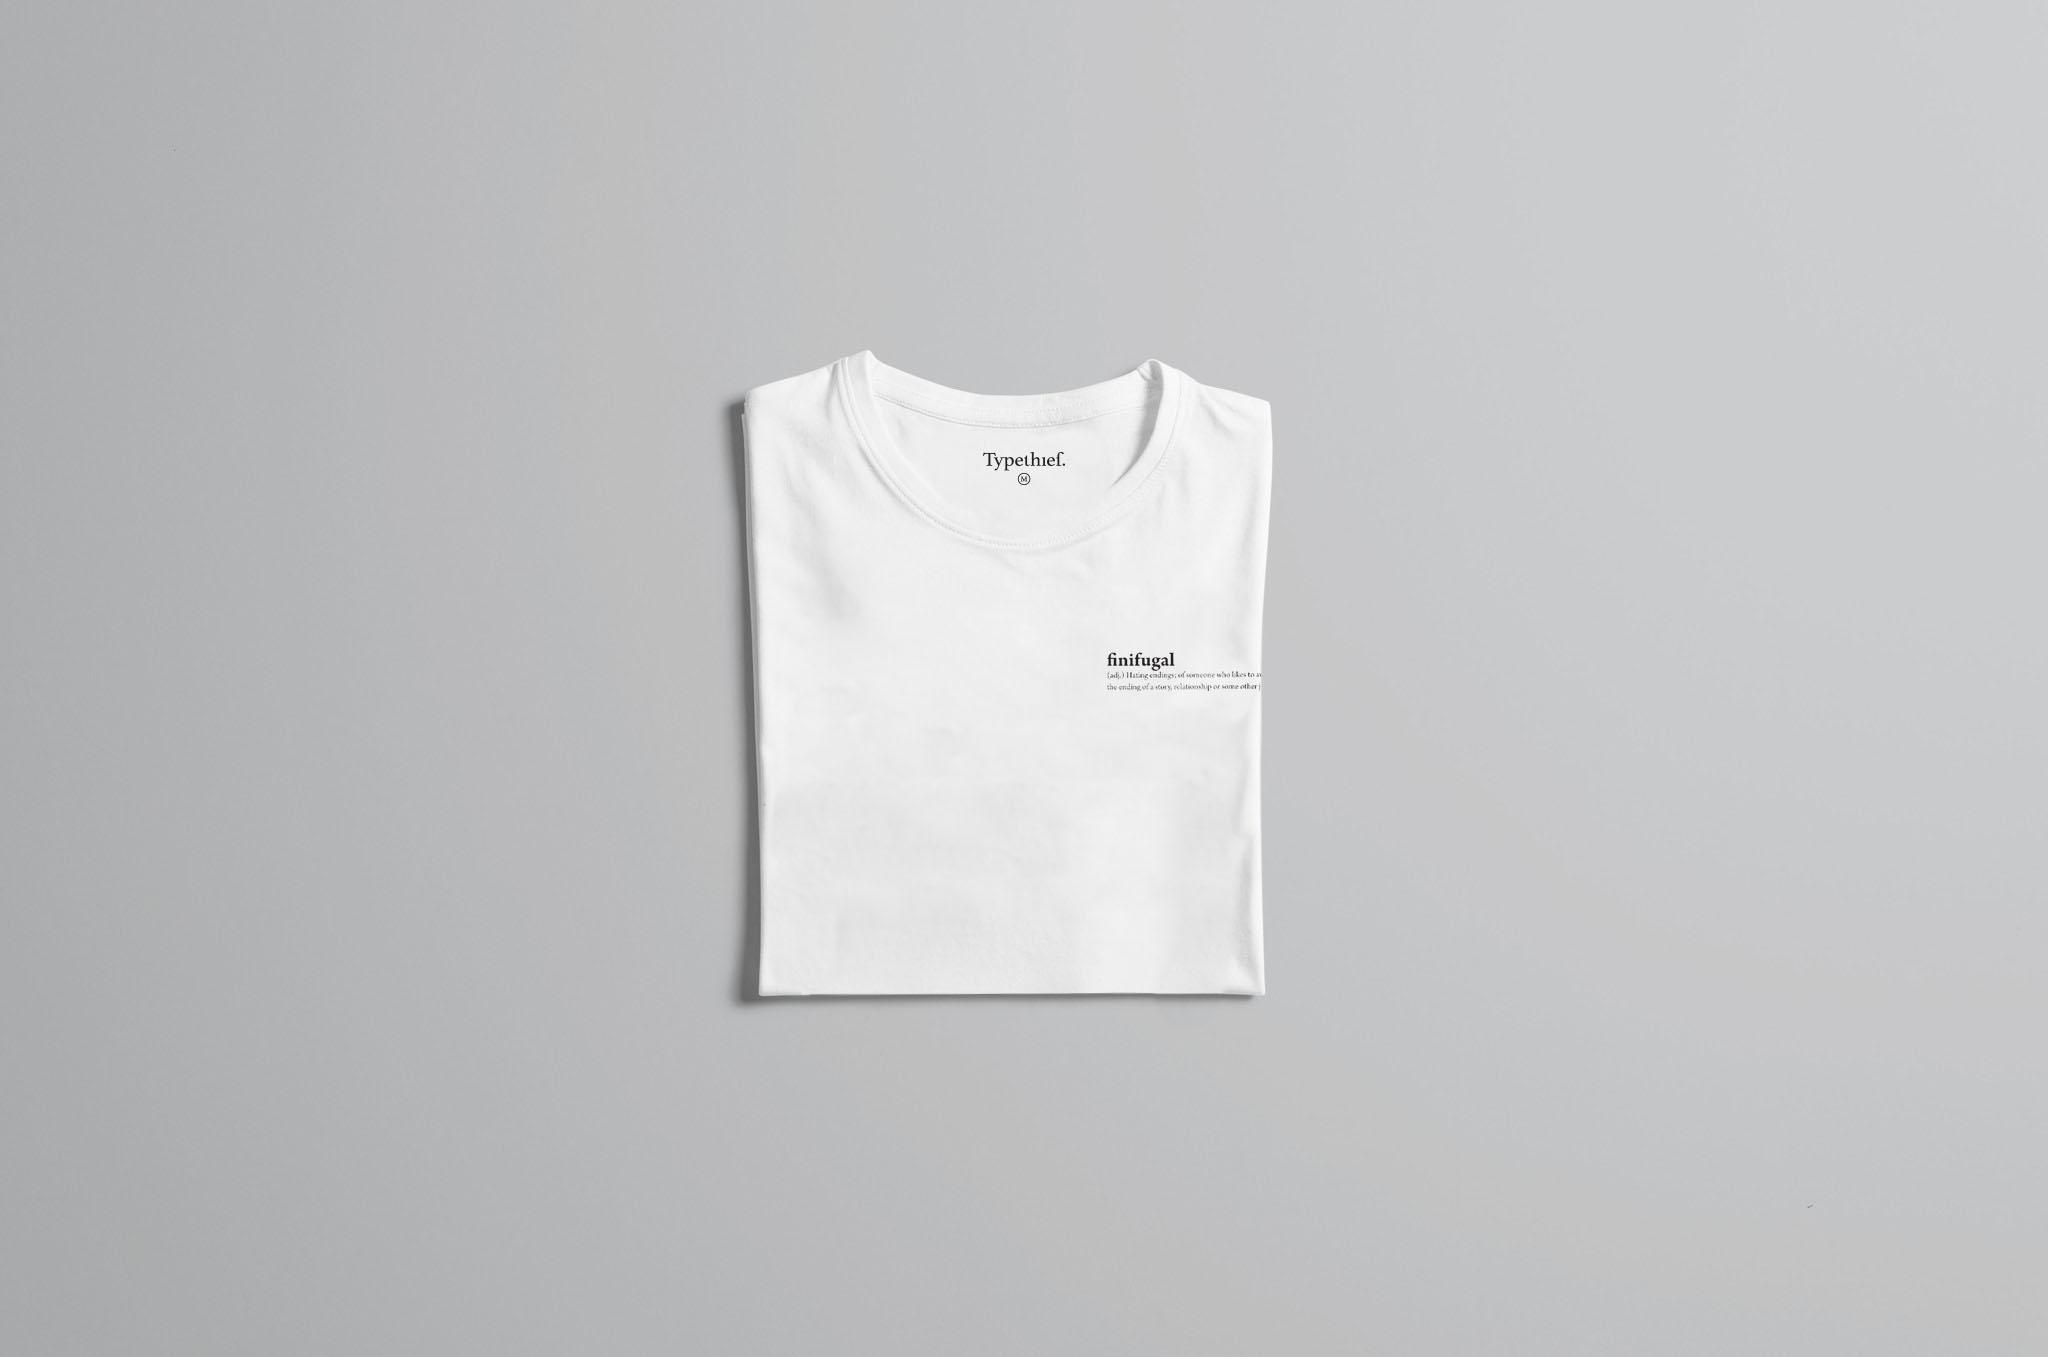 Typethief_Bespoke_Type_Branding_Clothing_Fashion_2